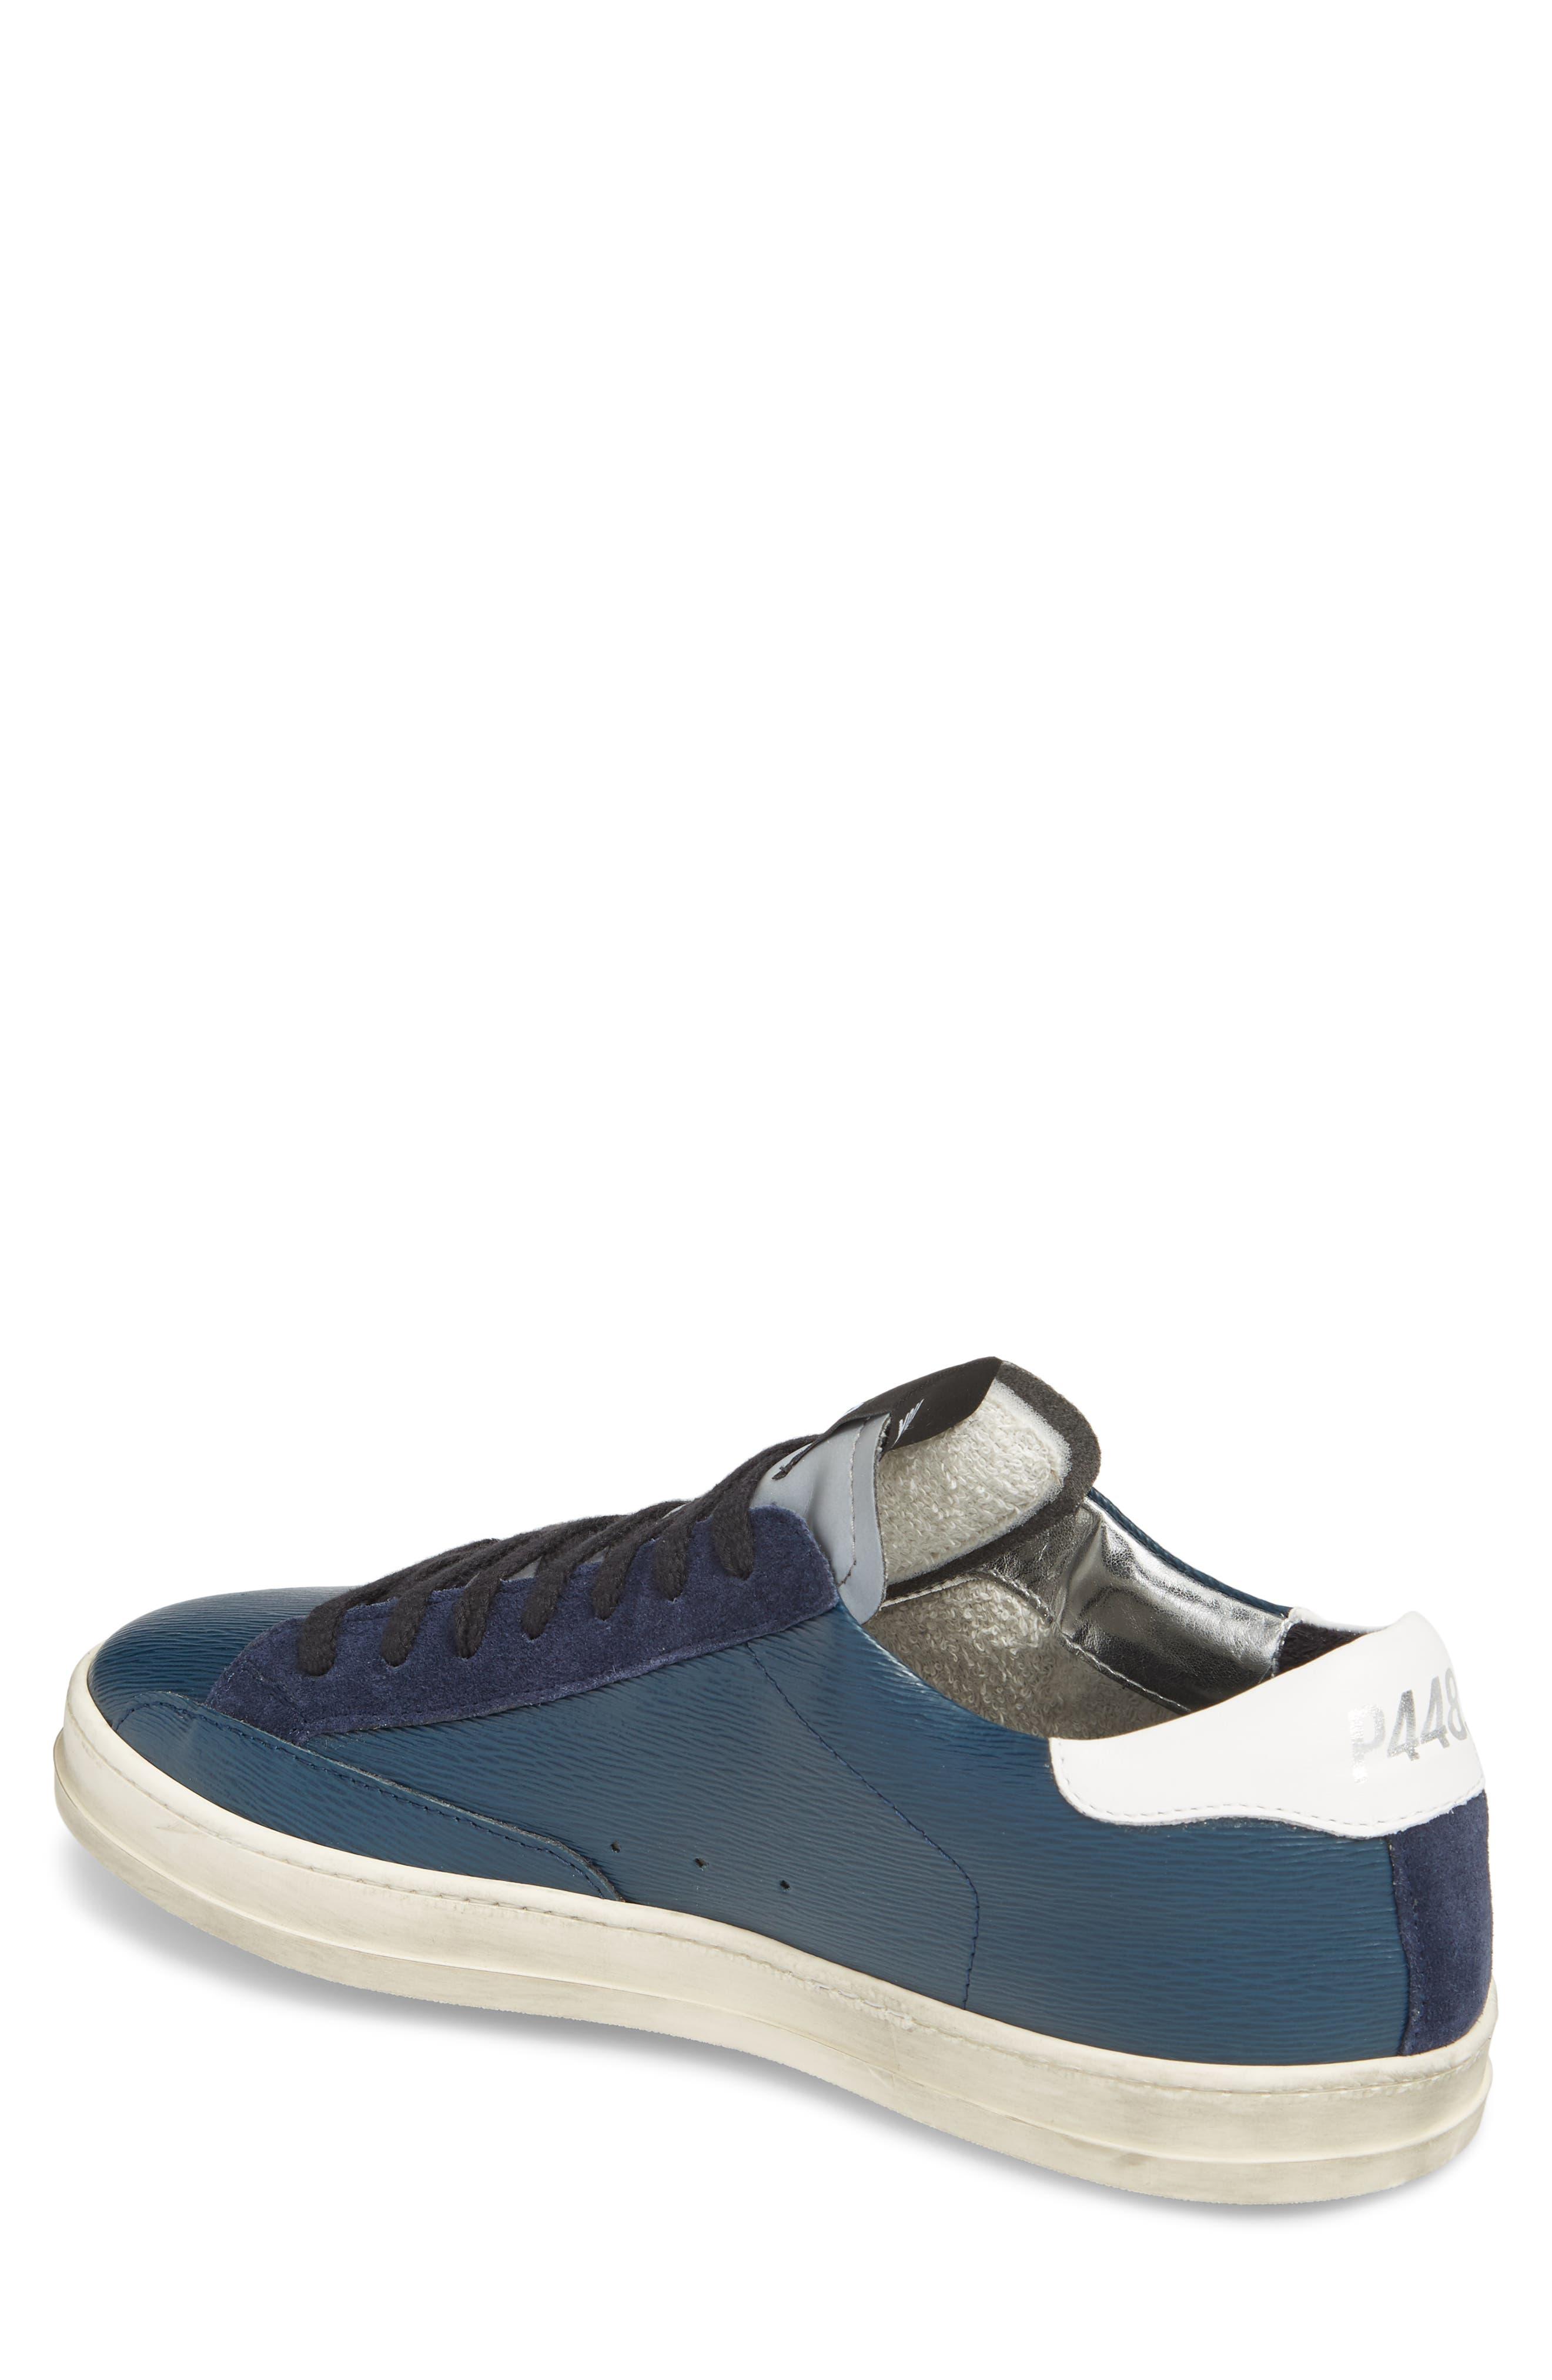 John Low Top Sneaker,                             Alternate thumbnail 2, color,                             Navy